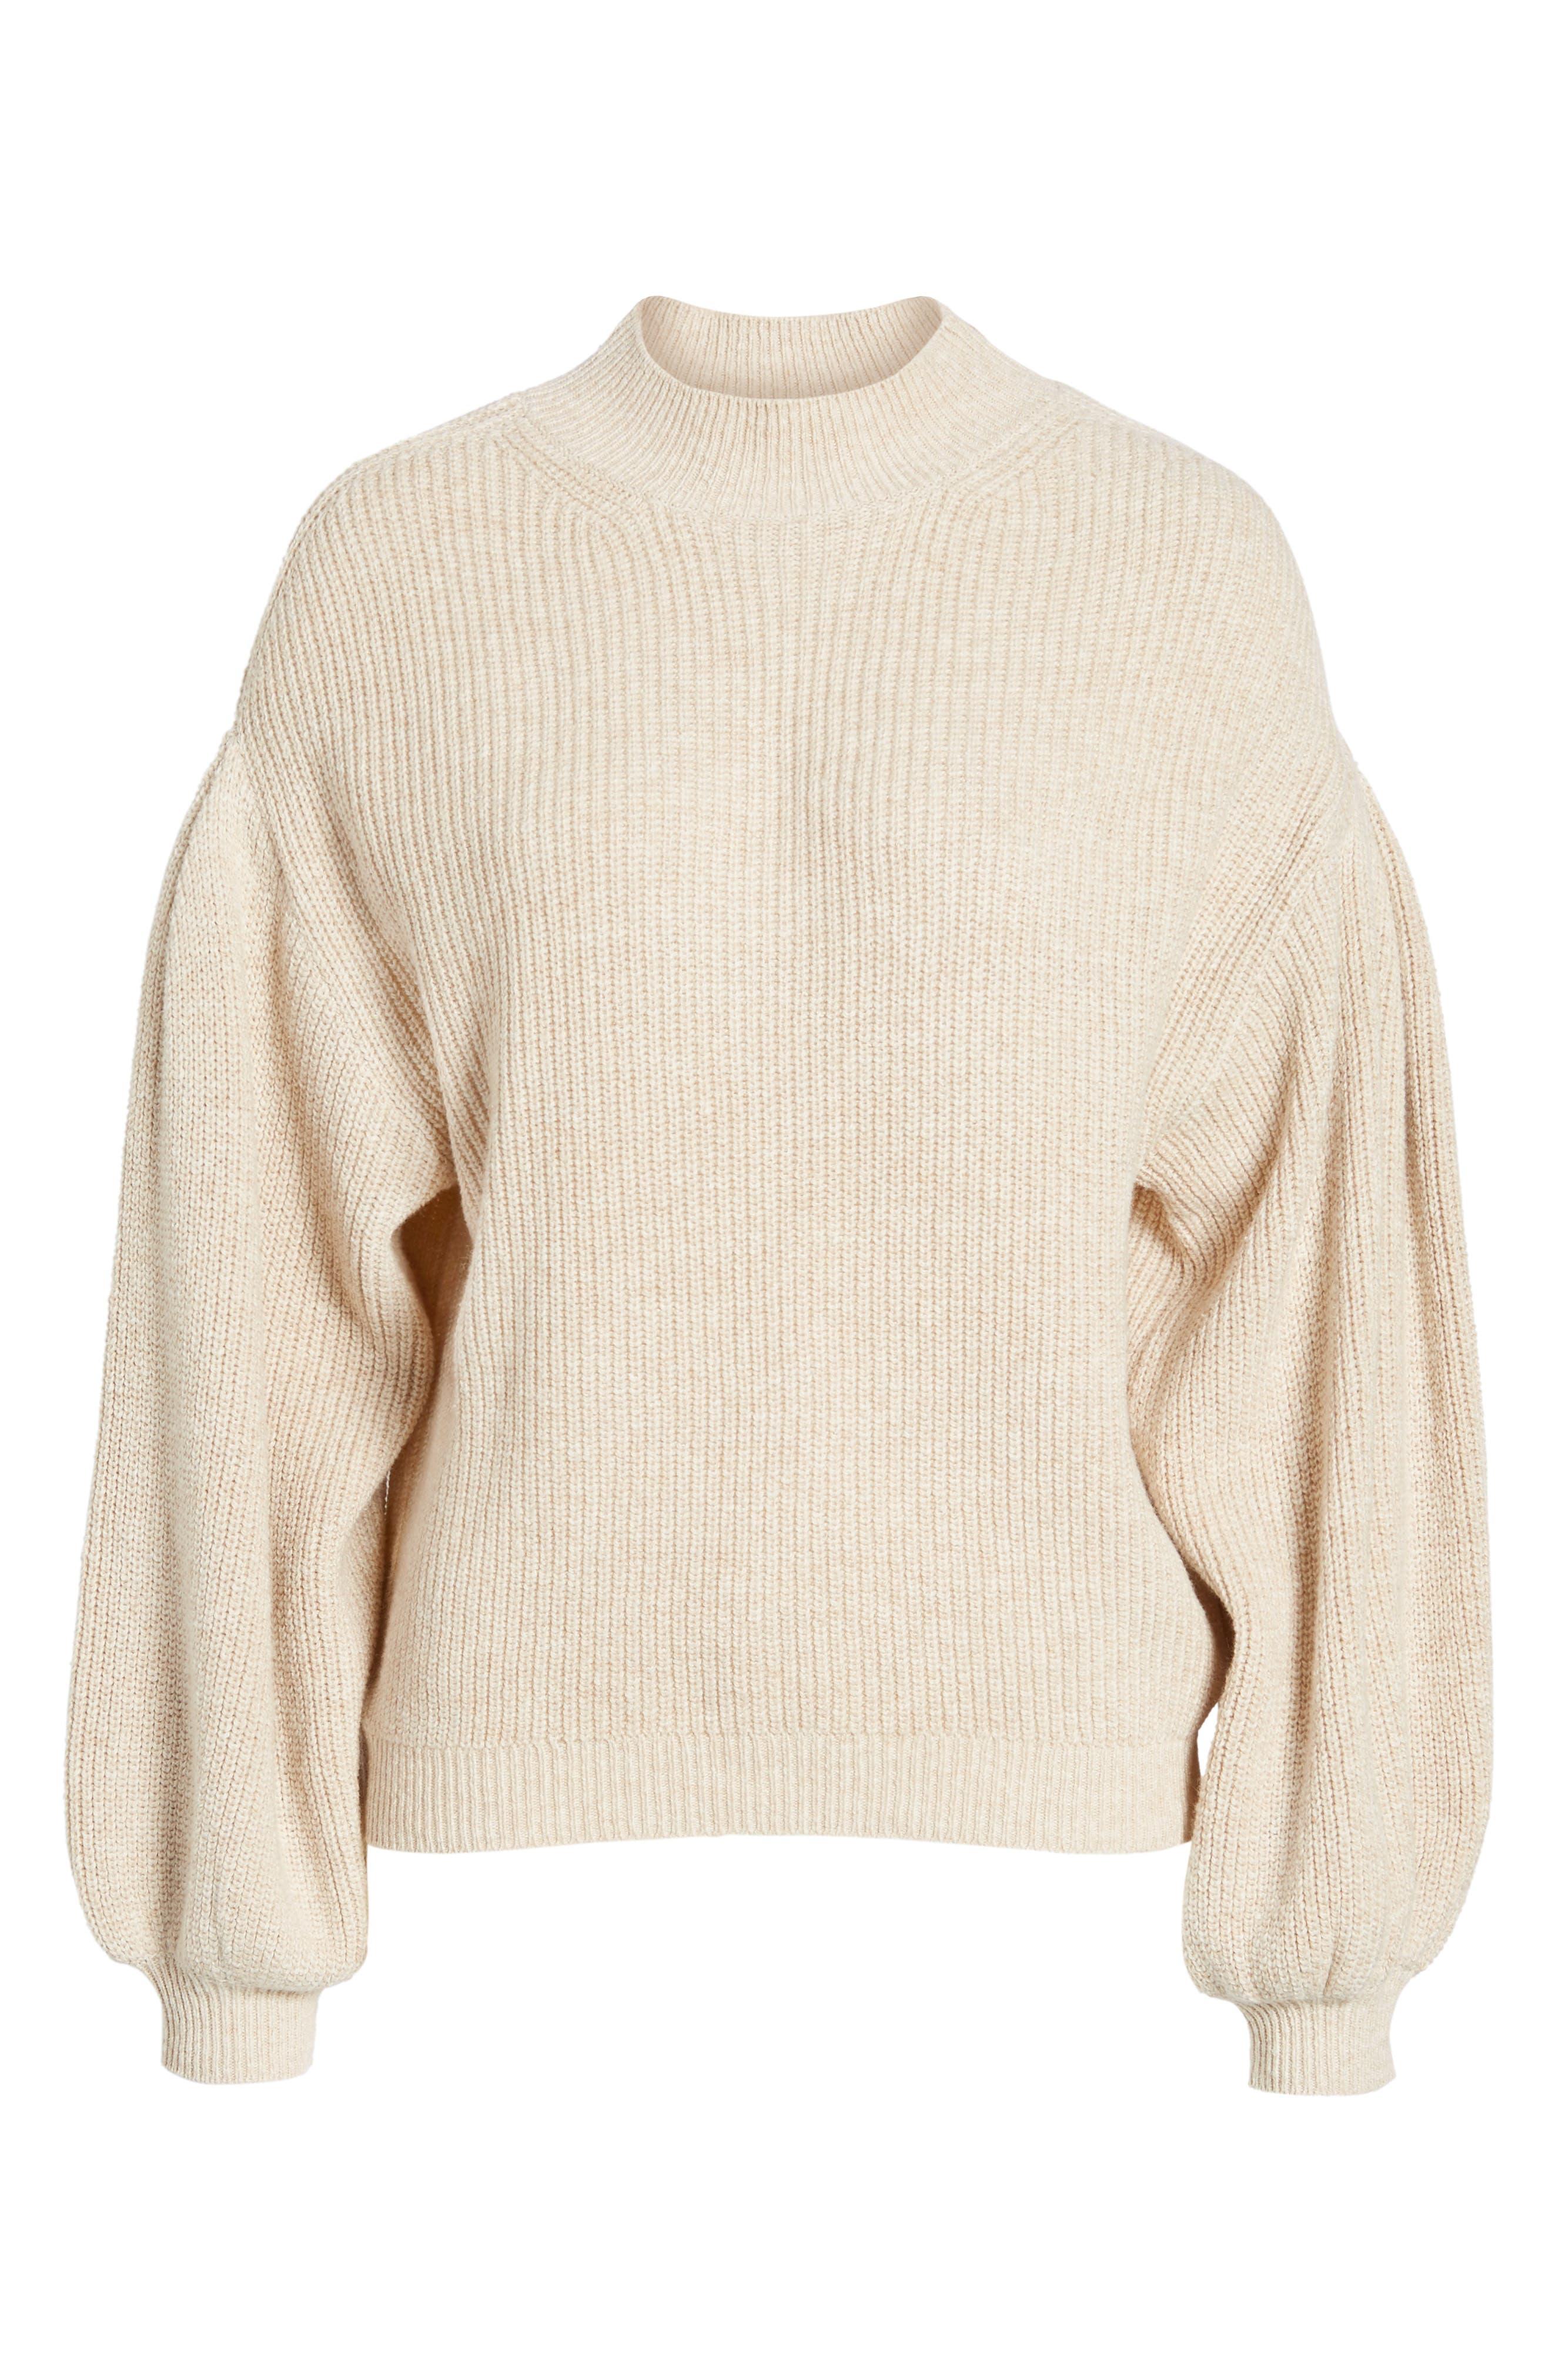 Blouson Sleeve Sweater,                             Alternate thumbnail 28, color,